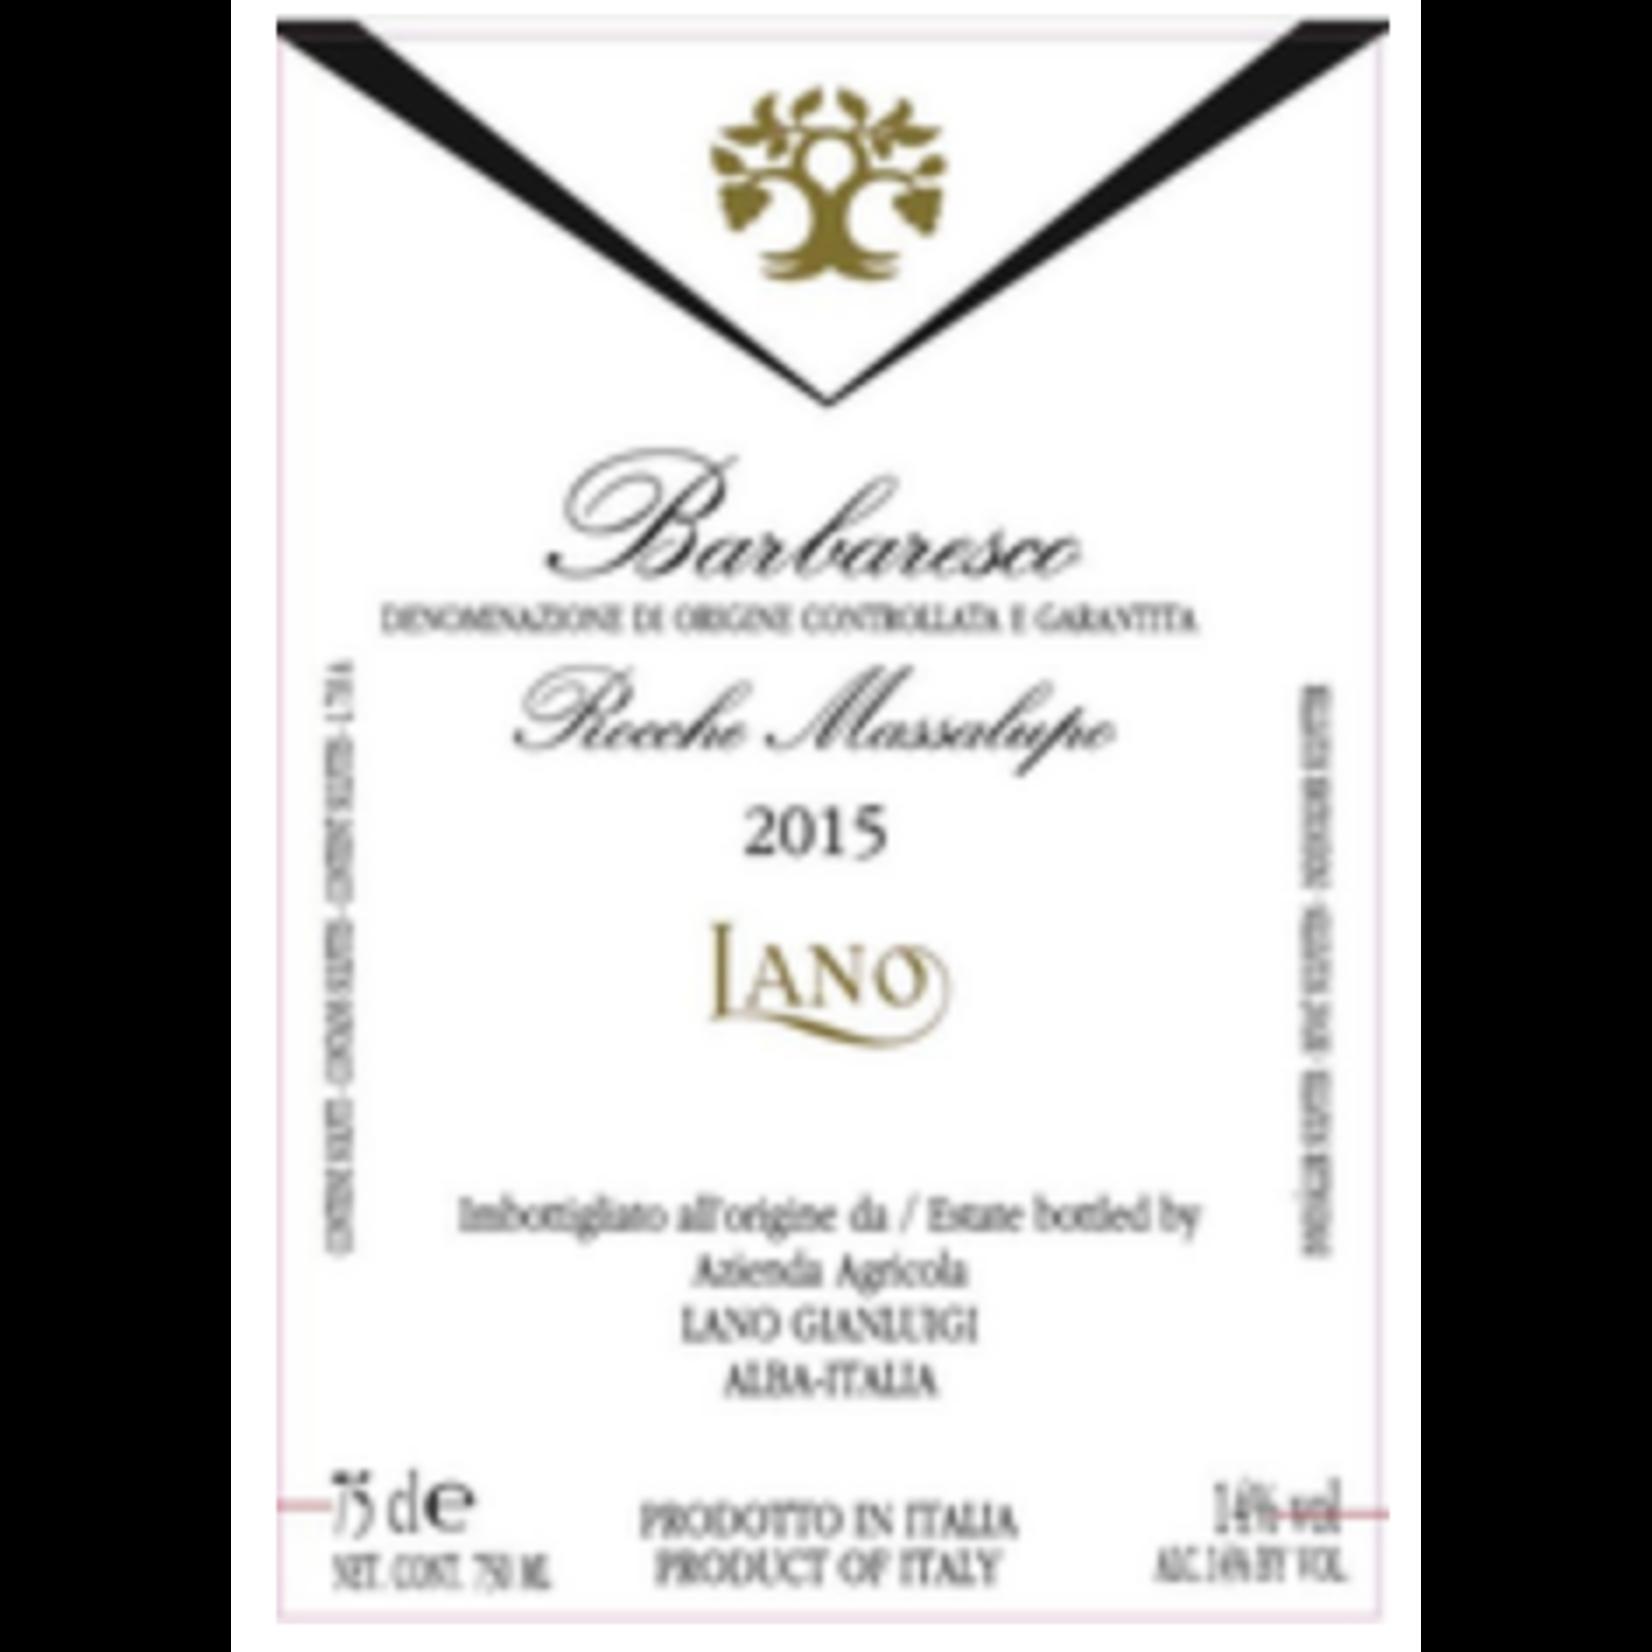 Wine Azienda Agricola Lano Gianluigi Barbaresco 'Rocche Massalupo 2016